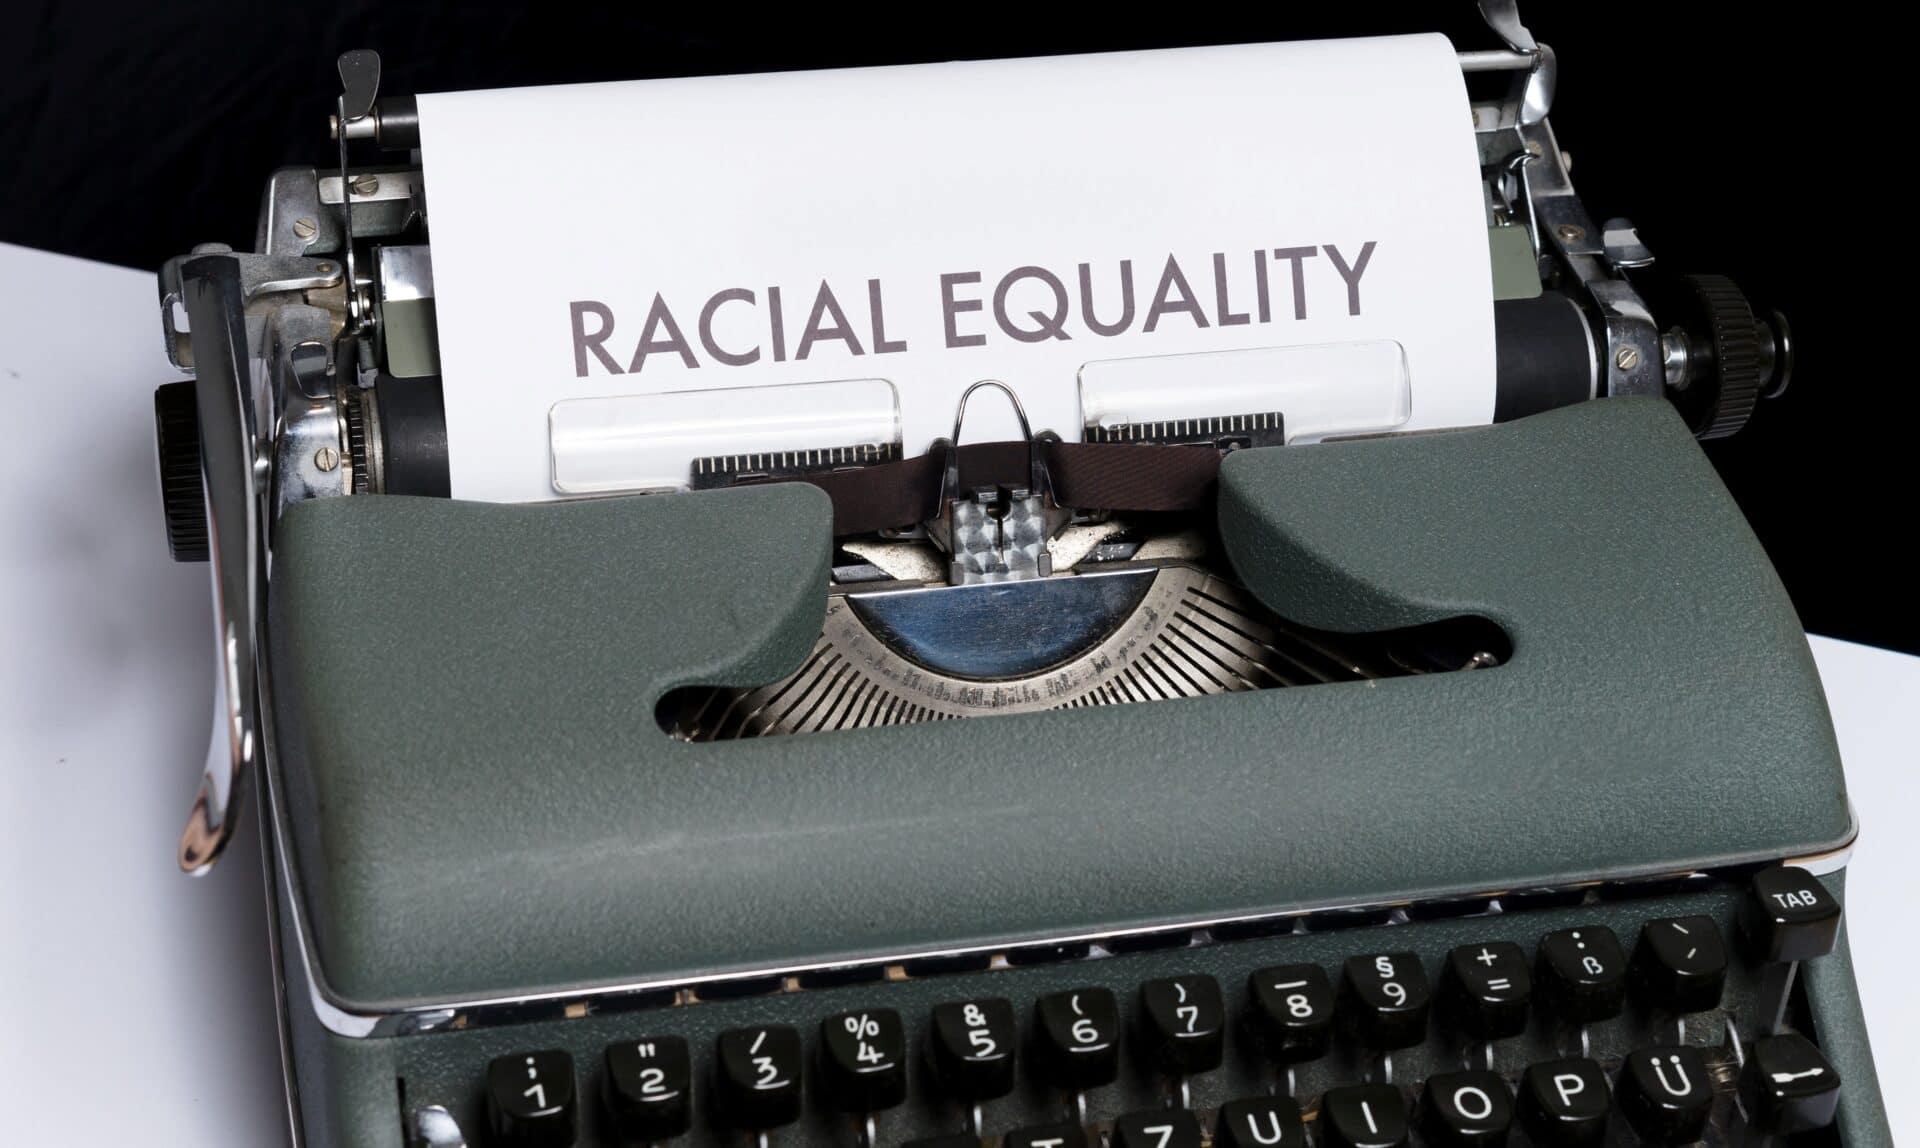 Racial-equality-448x249-c-default.jpg